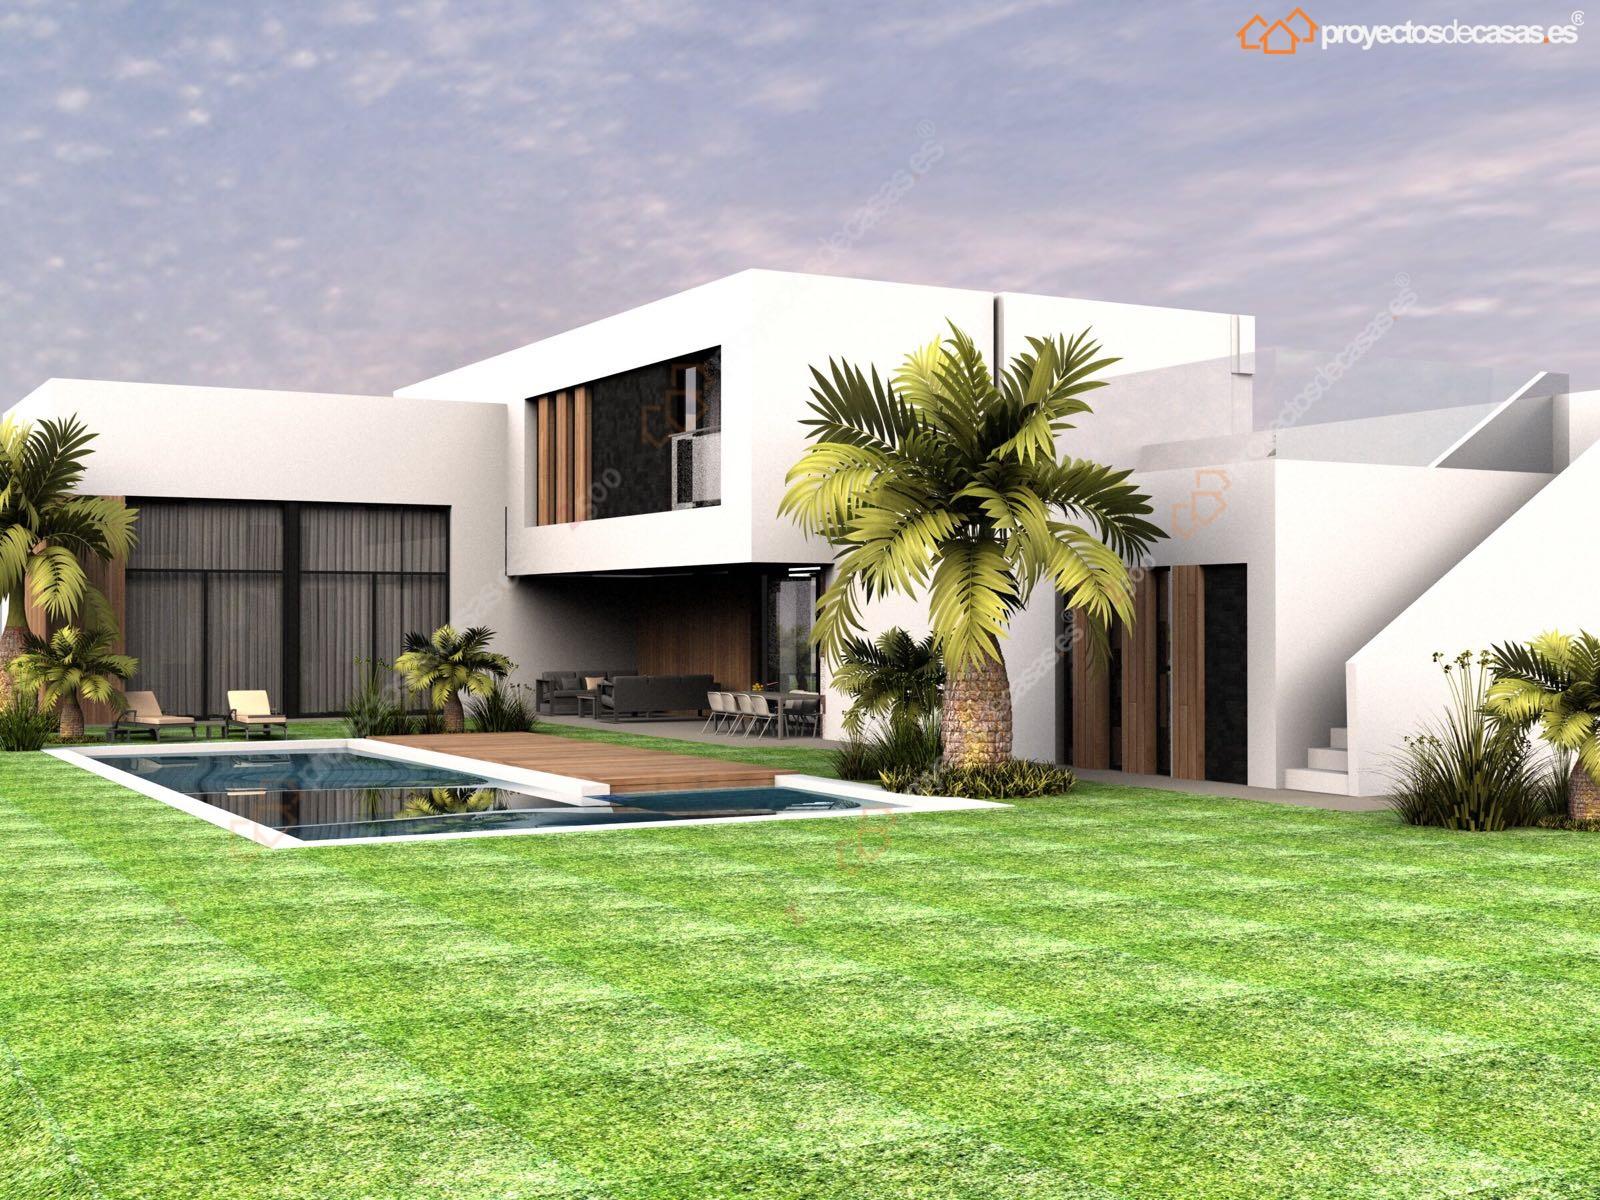 Proyectos de casas dise o y construcci n de casas for Casa moderna ma calda